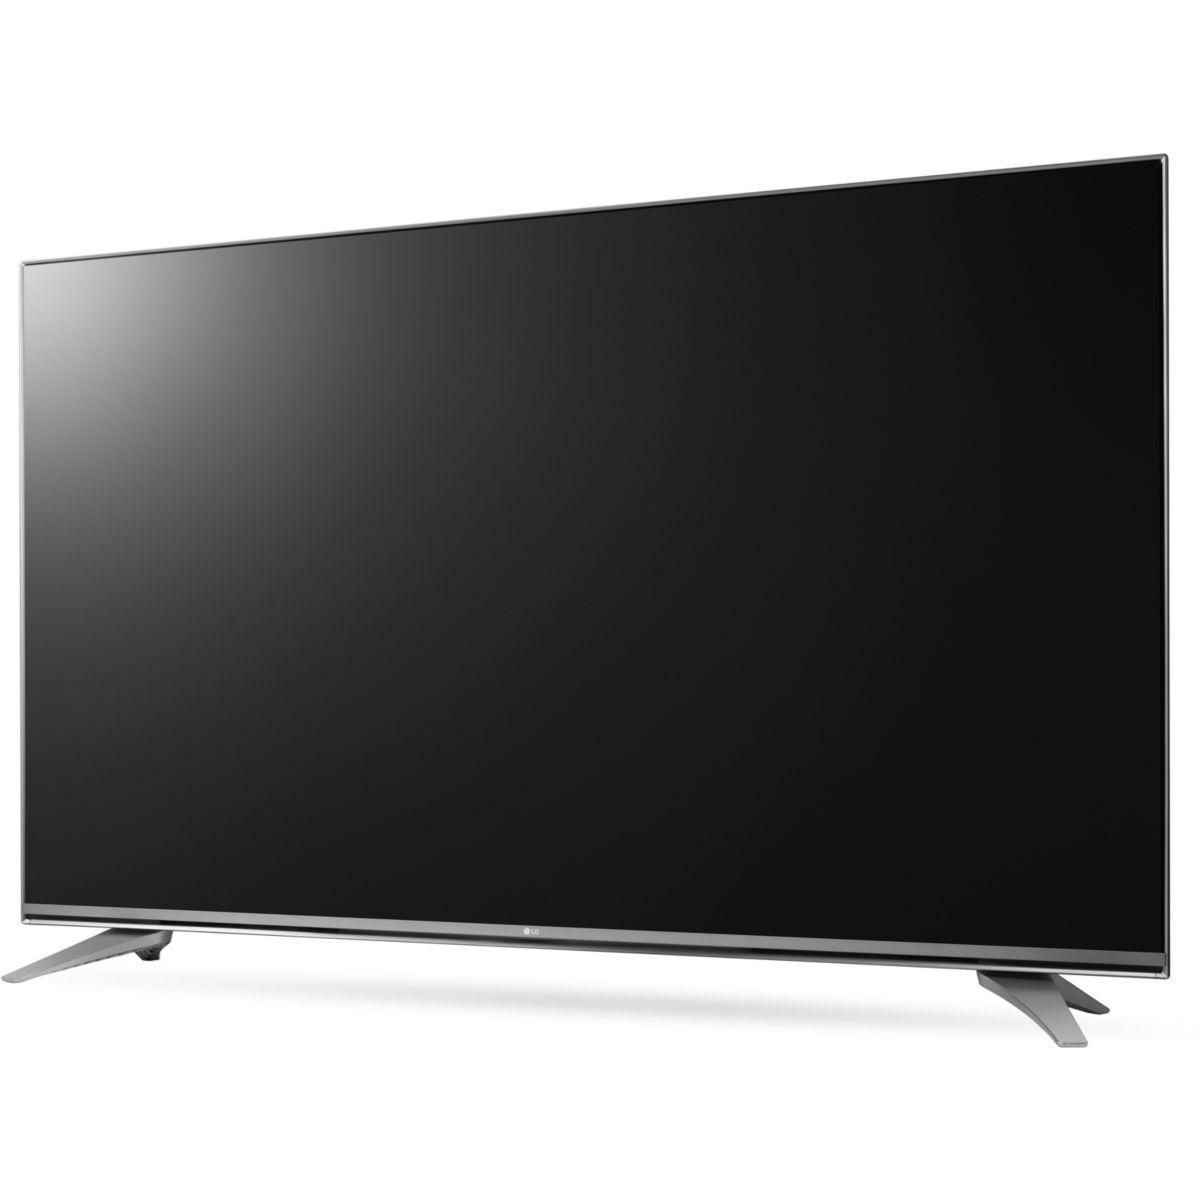 TV LG 55UH750V 4K 1900 PMI SMART TV